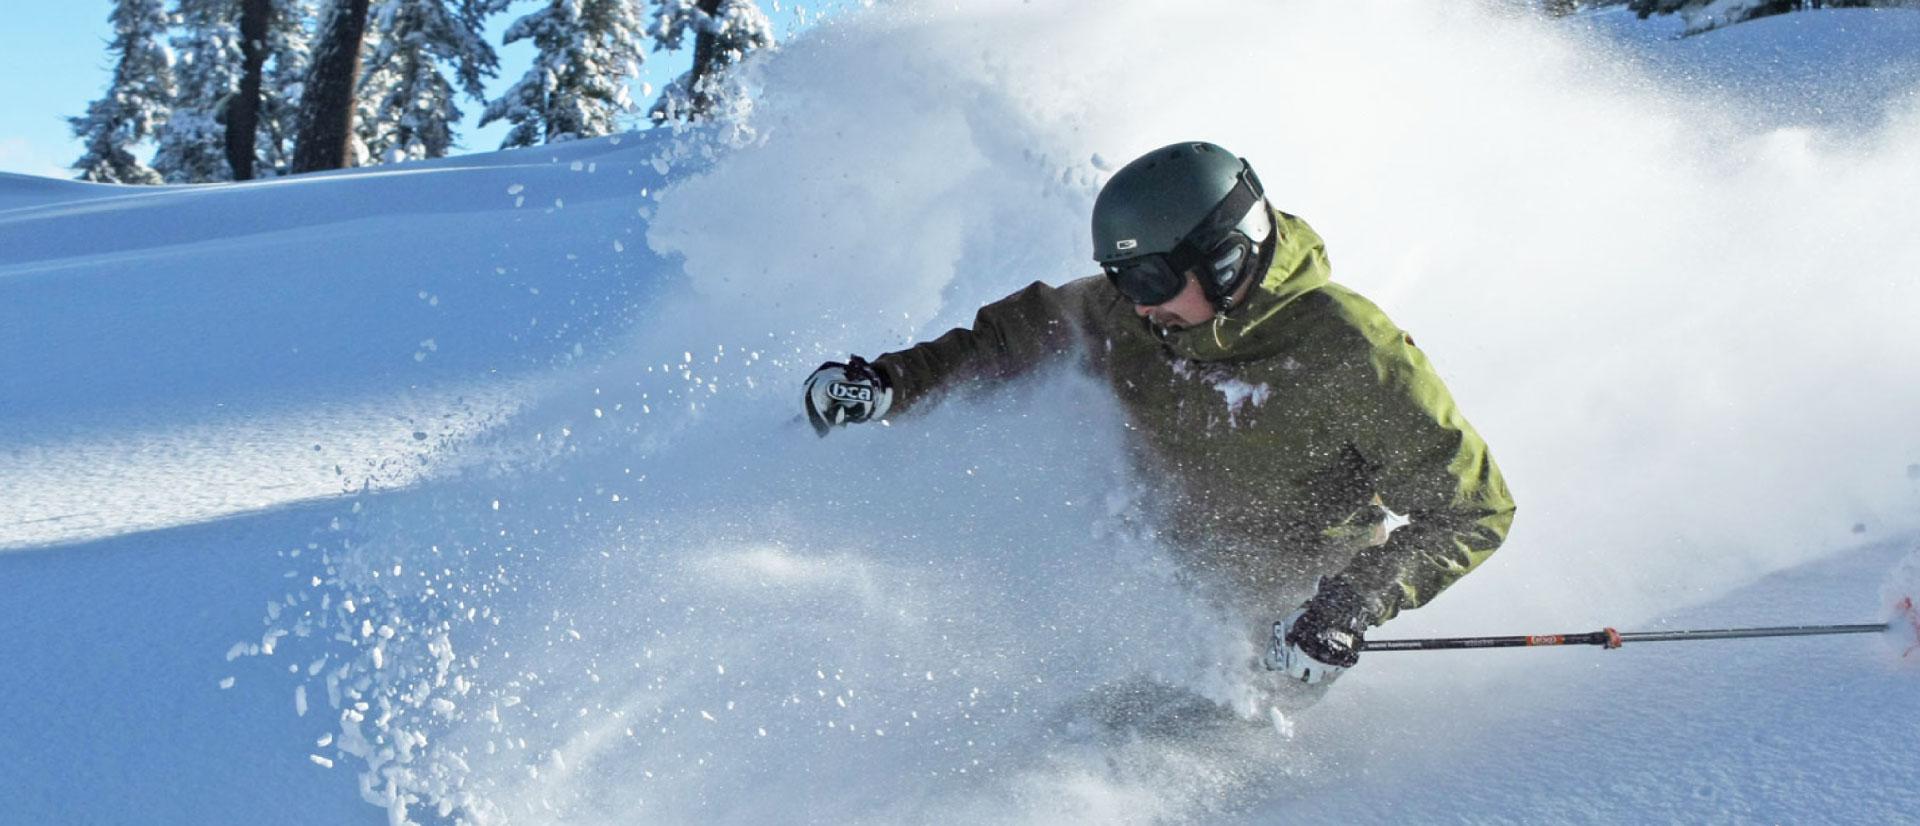 Dodge Ridge Ski Area 2018/19 Season Passes